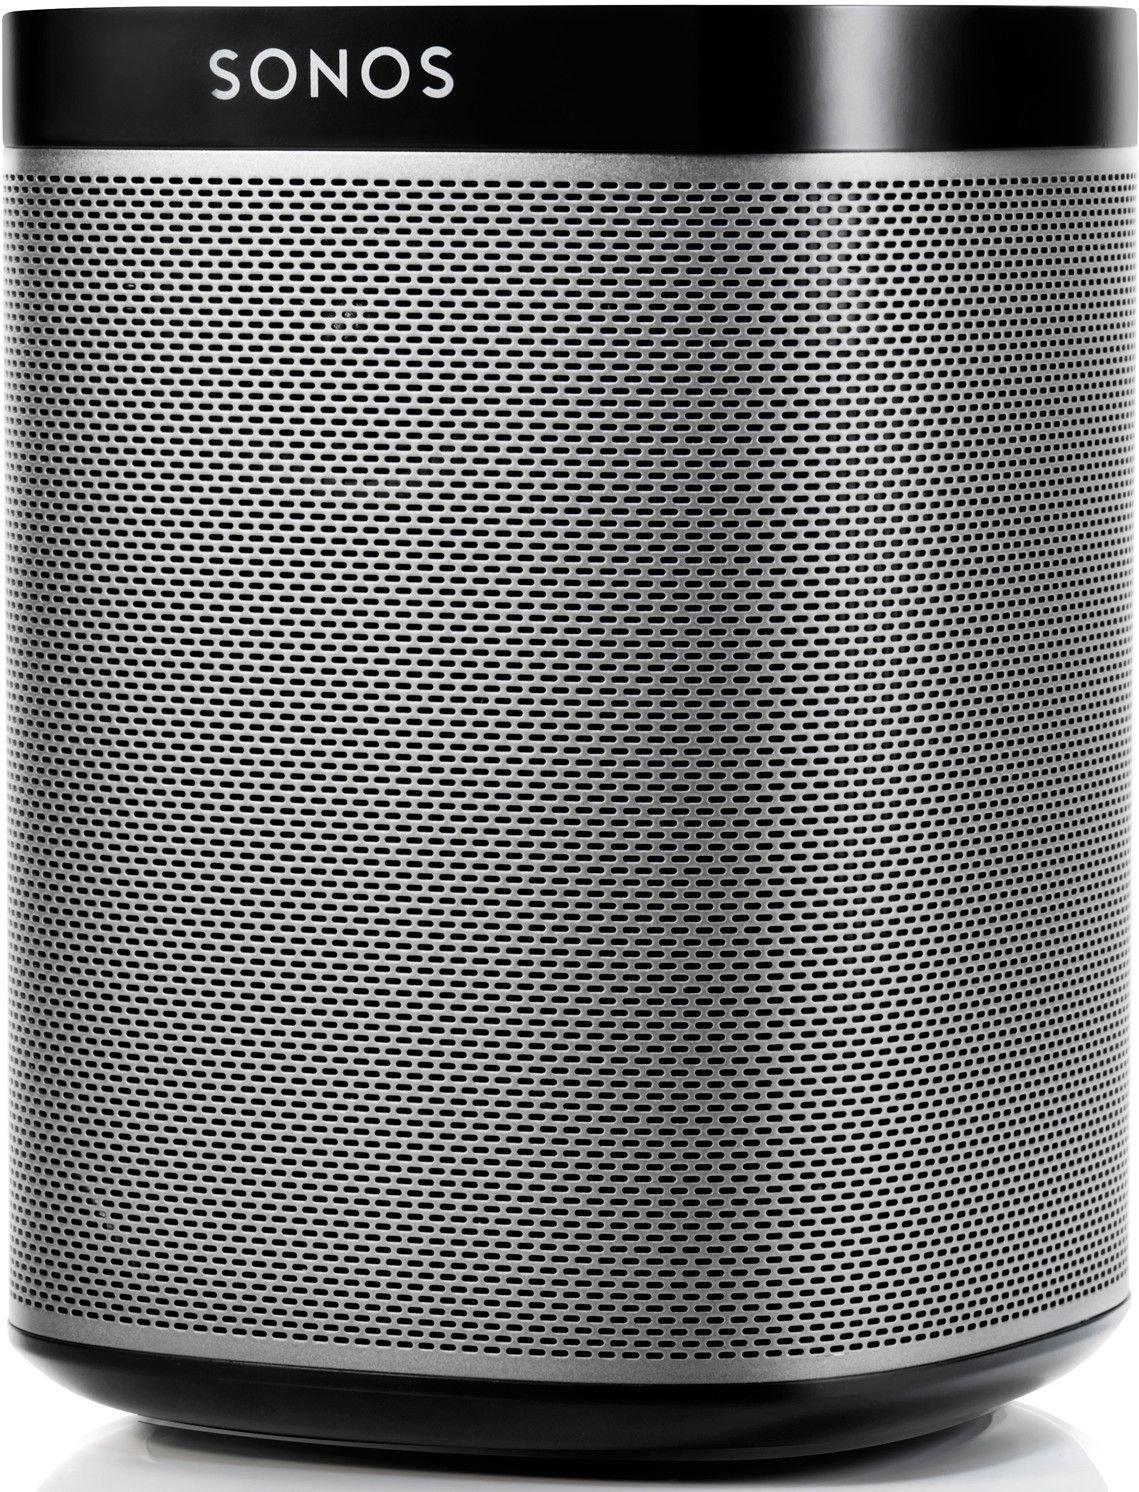 Best pris på Sonos Play:1 Se priser før kjøp i Prisguiden